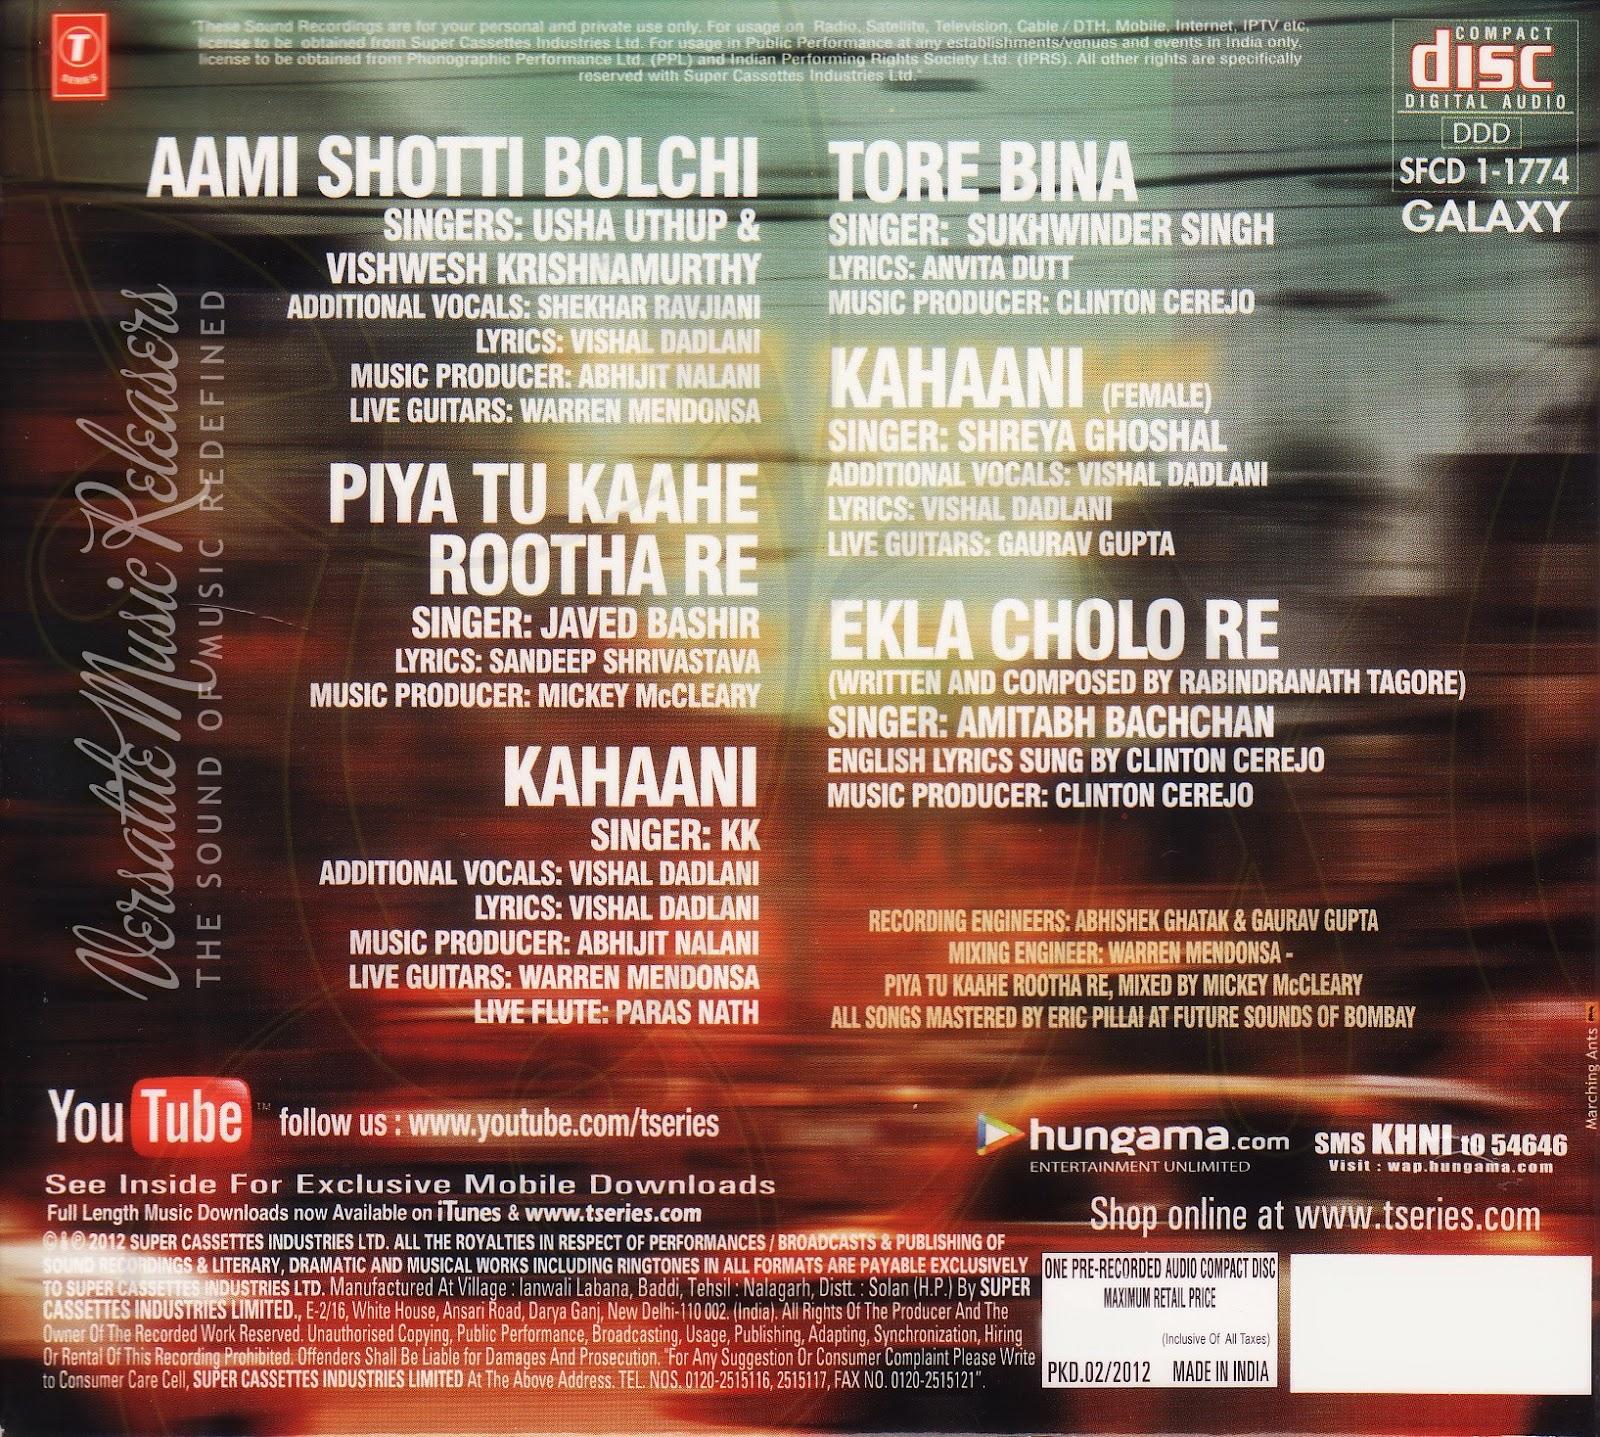 Ekla chalo re lyrics [bengali | rom | eng] | shreya ghoshal youtube.